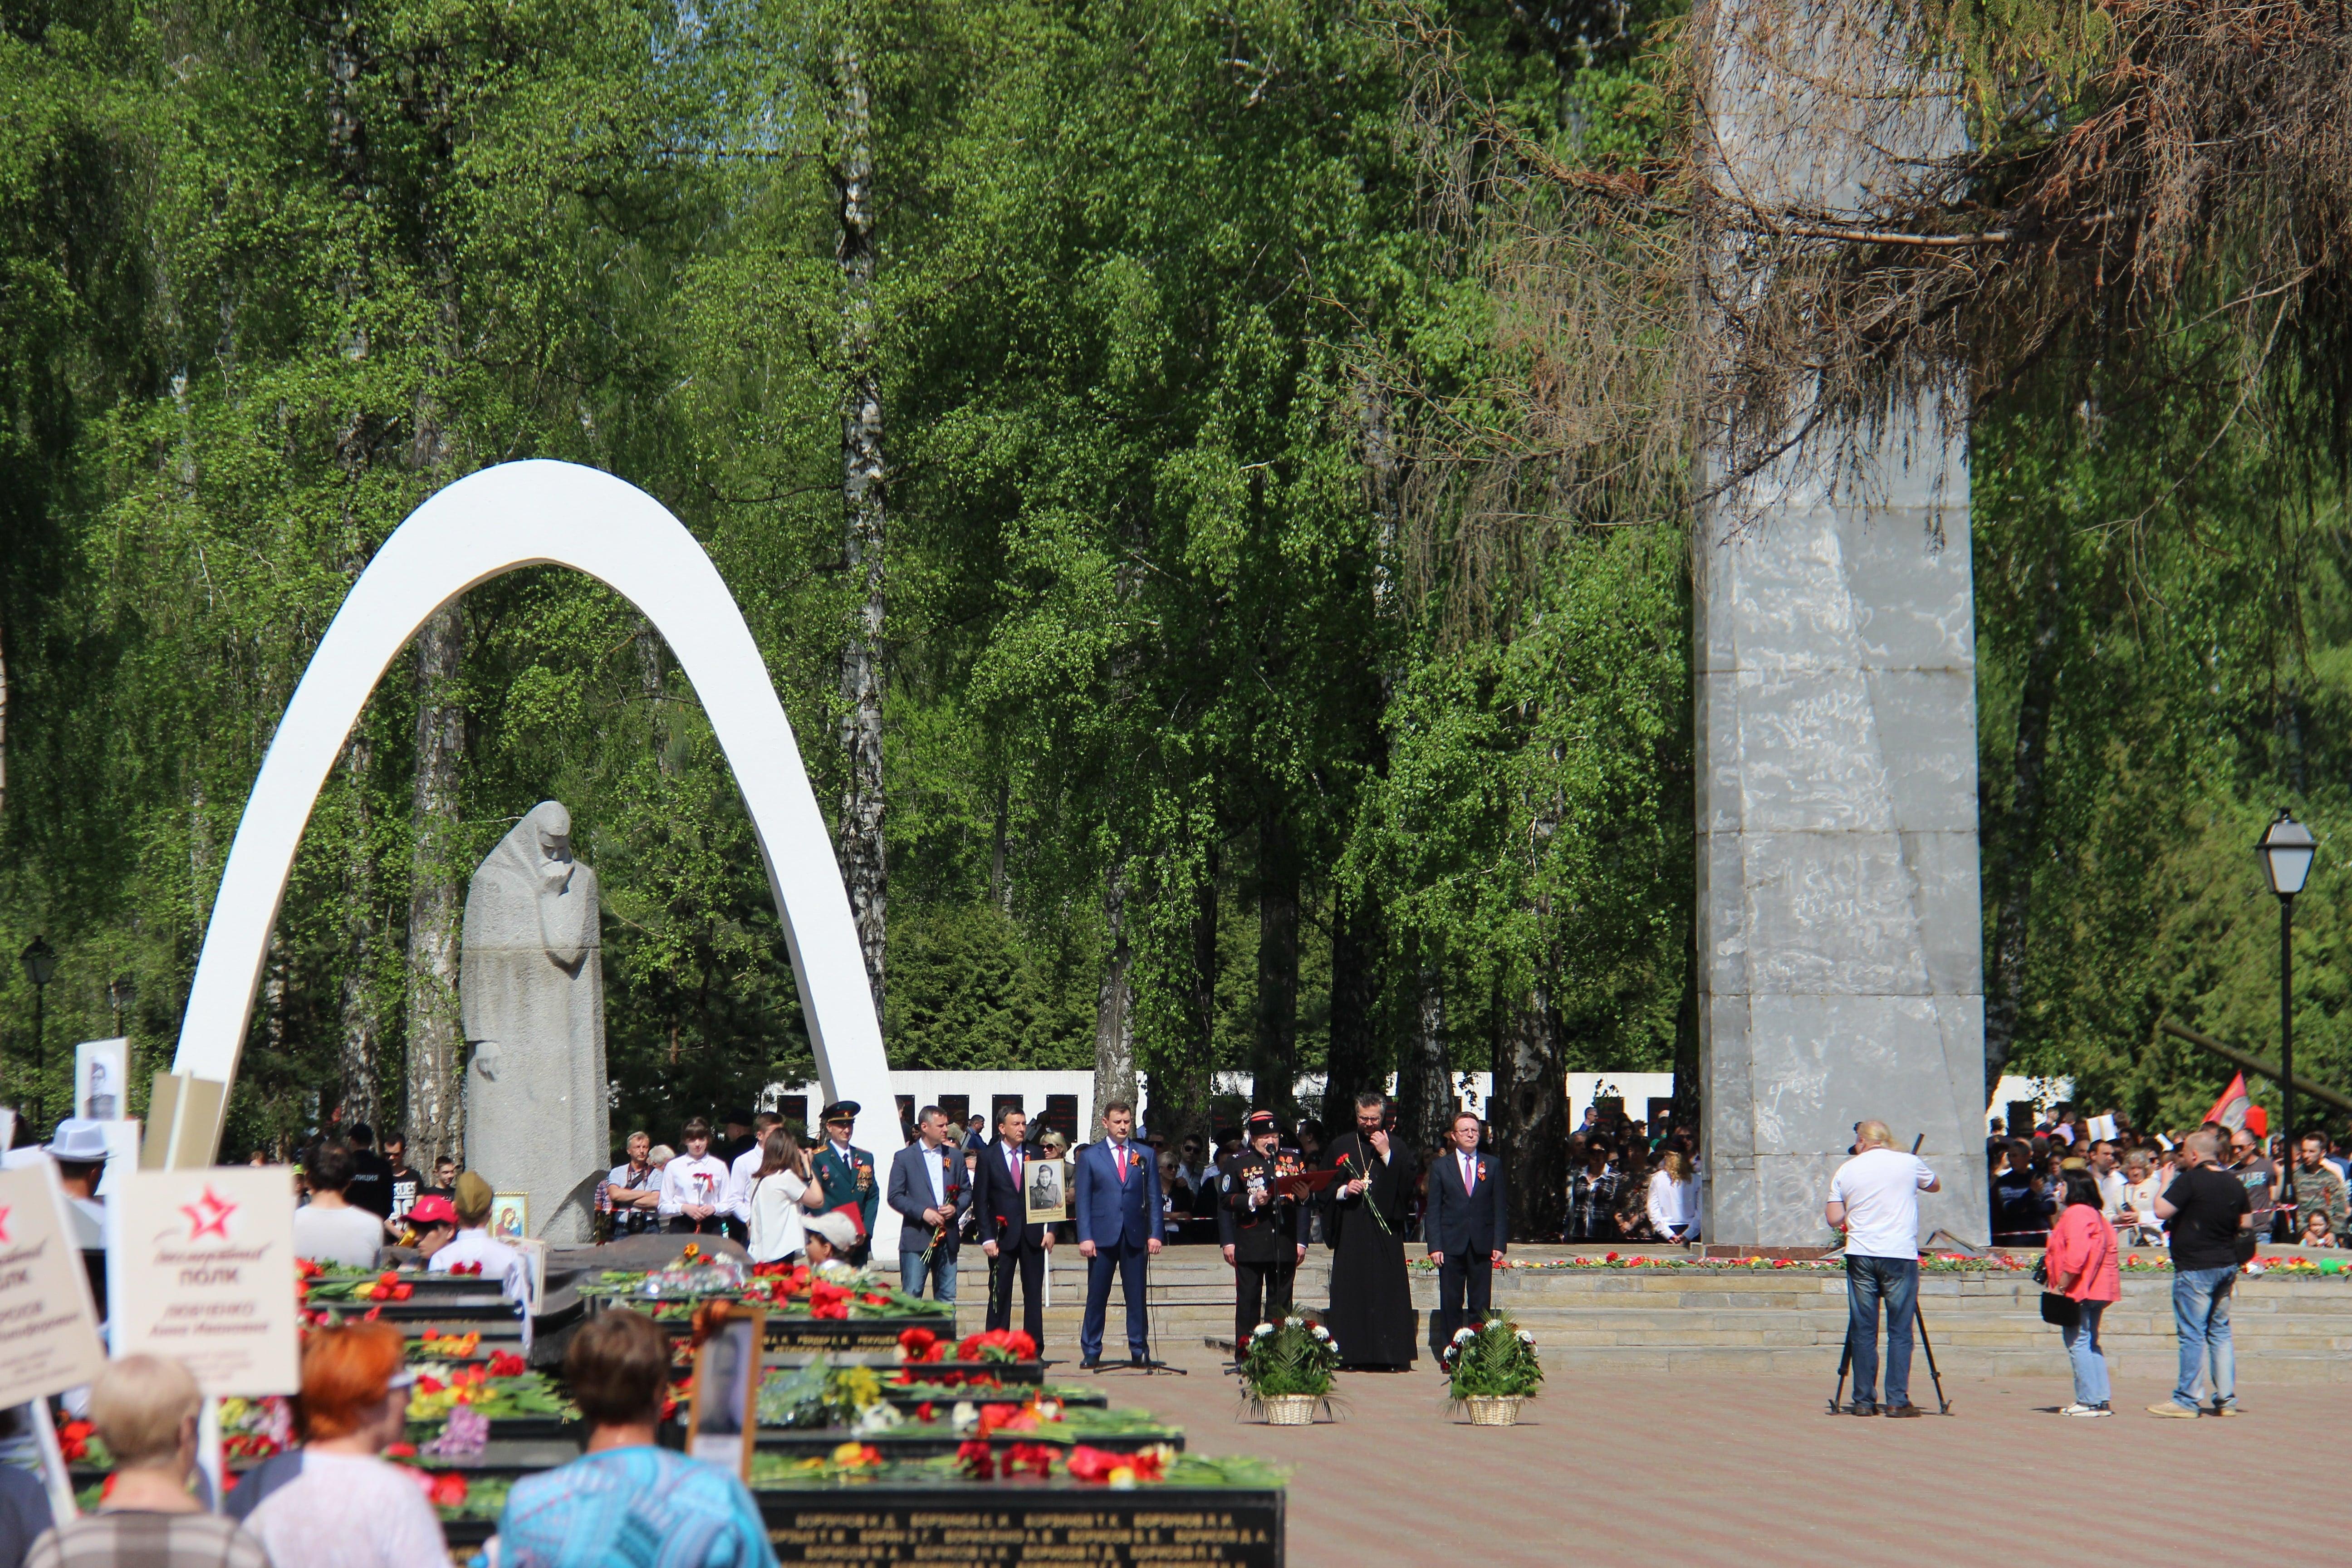 http://monuspen.ru/photoreports/ba2010941251efe9afabca220cb49d88.JPG